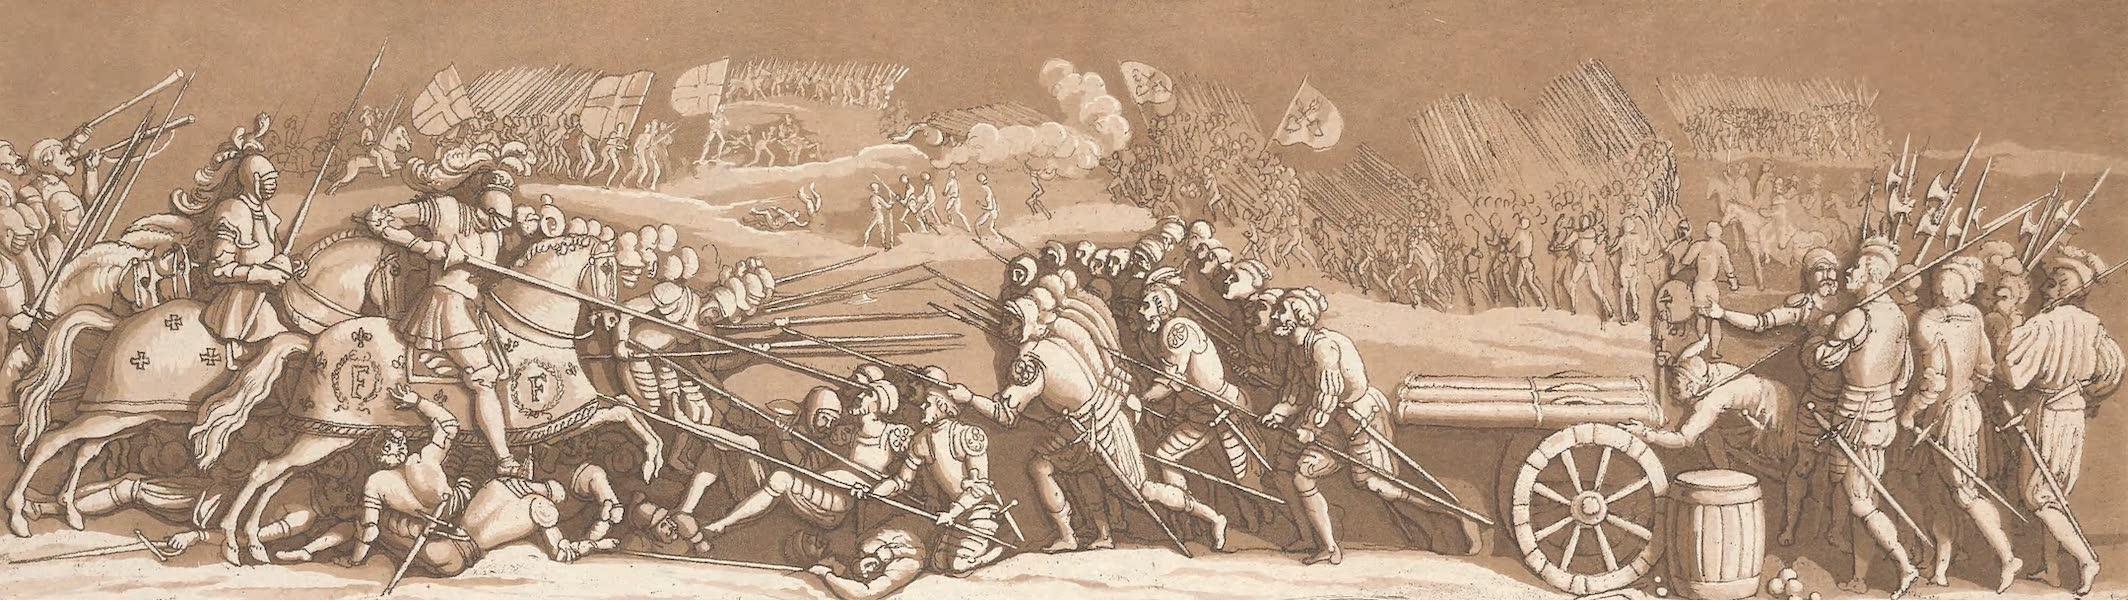 Le Costume Ancien et Moderne [Europe] Vol. 4 - XV. Bas-relief de Primaticcio representant la bataille de Melegnano (1824)